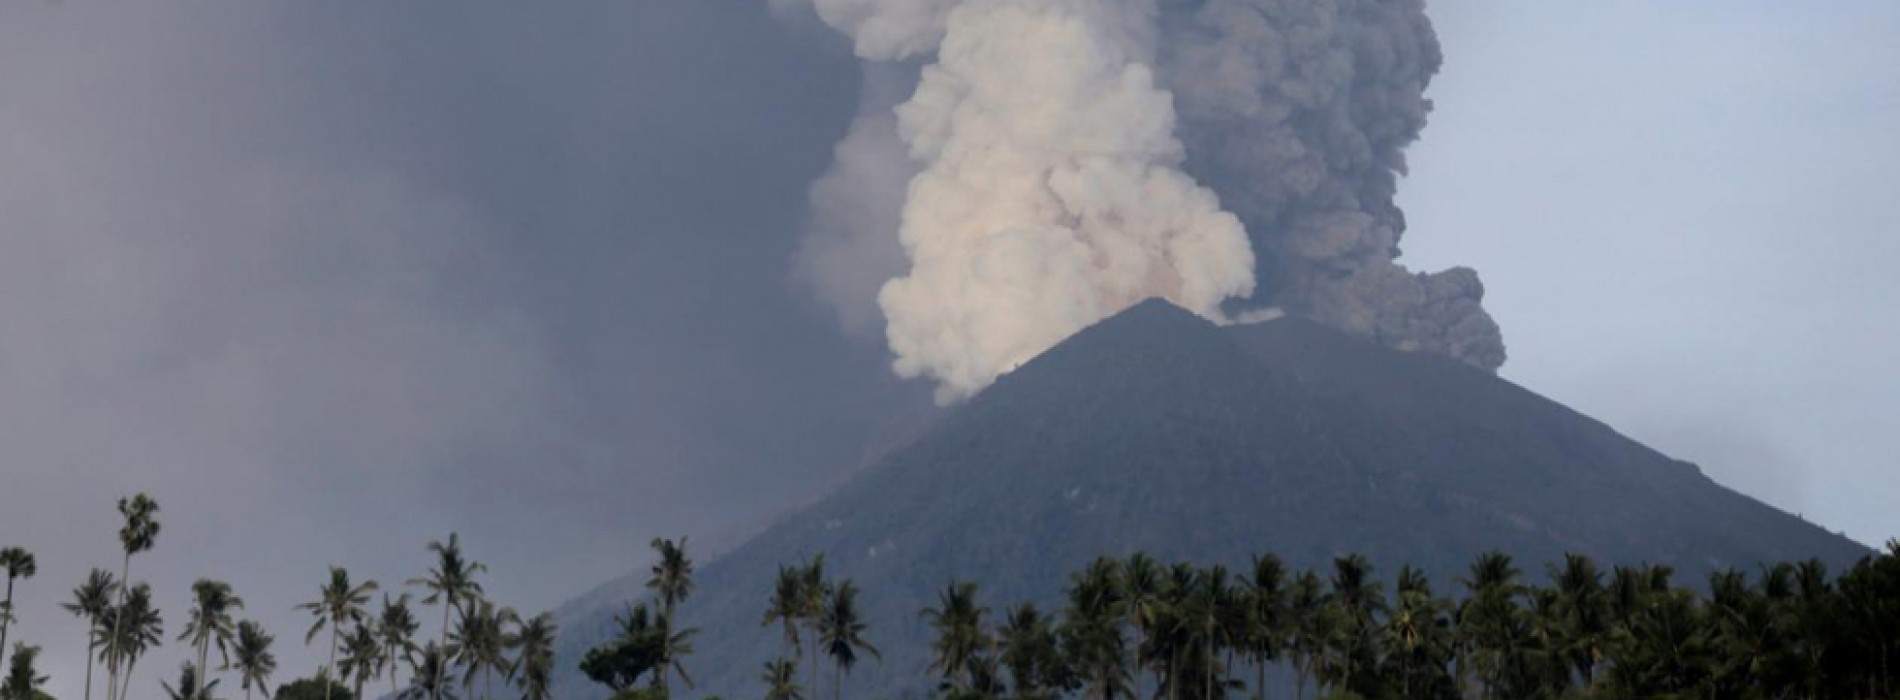 Indonesia raises Bali volcano alert to 'highest' warning of large eruption